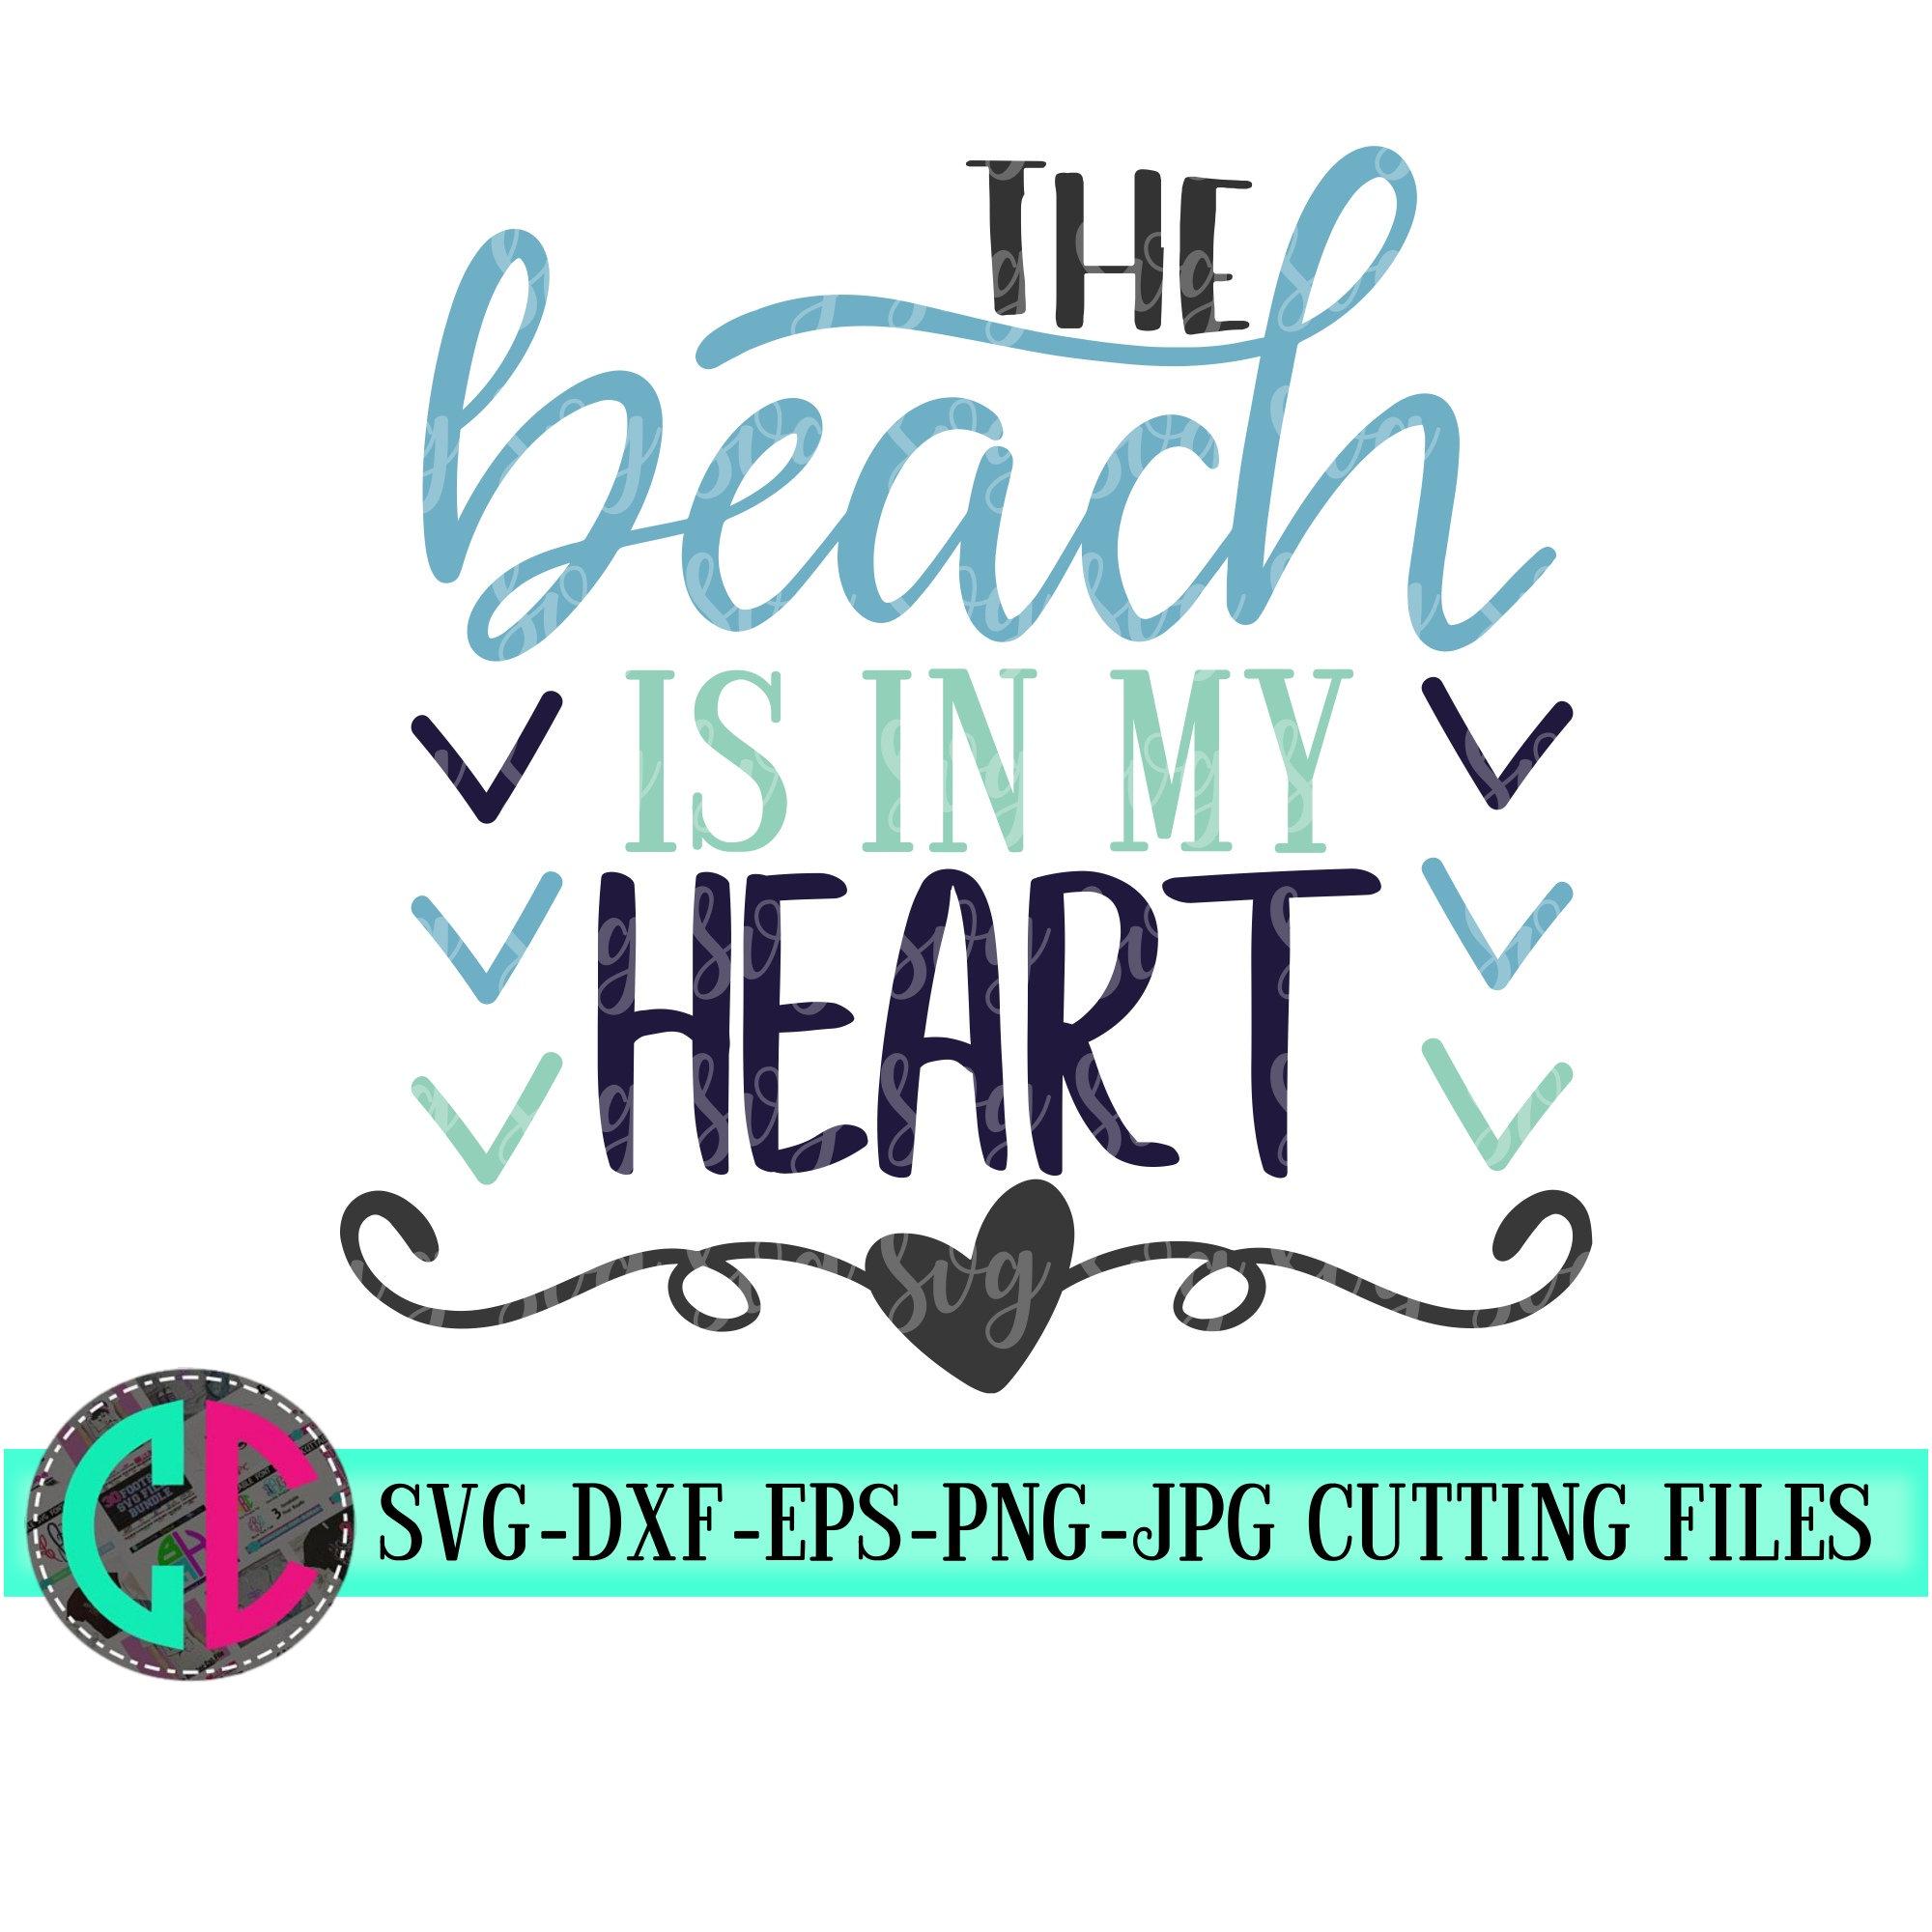 Beach Is In My Heart Svg Summer Svg Summer Quotes Svg Svg Beach Shirts Tshirt Svg Summertime Svg Cricut Designs Silhouette Designs